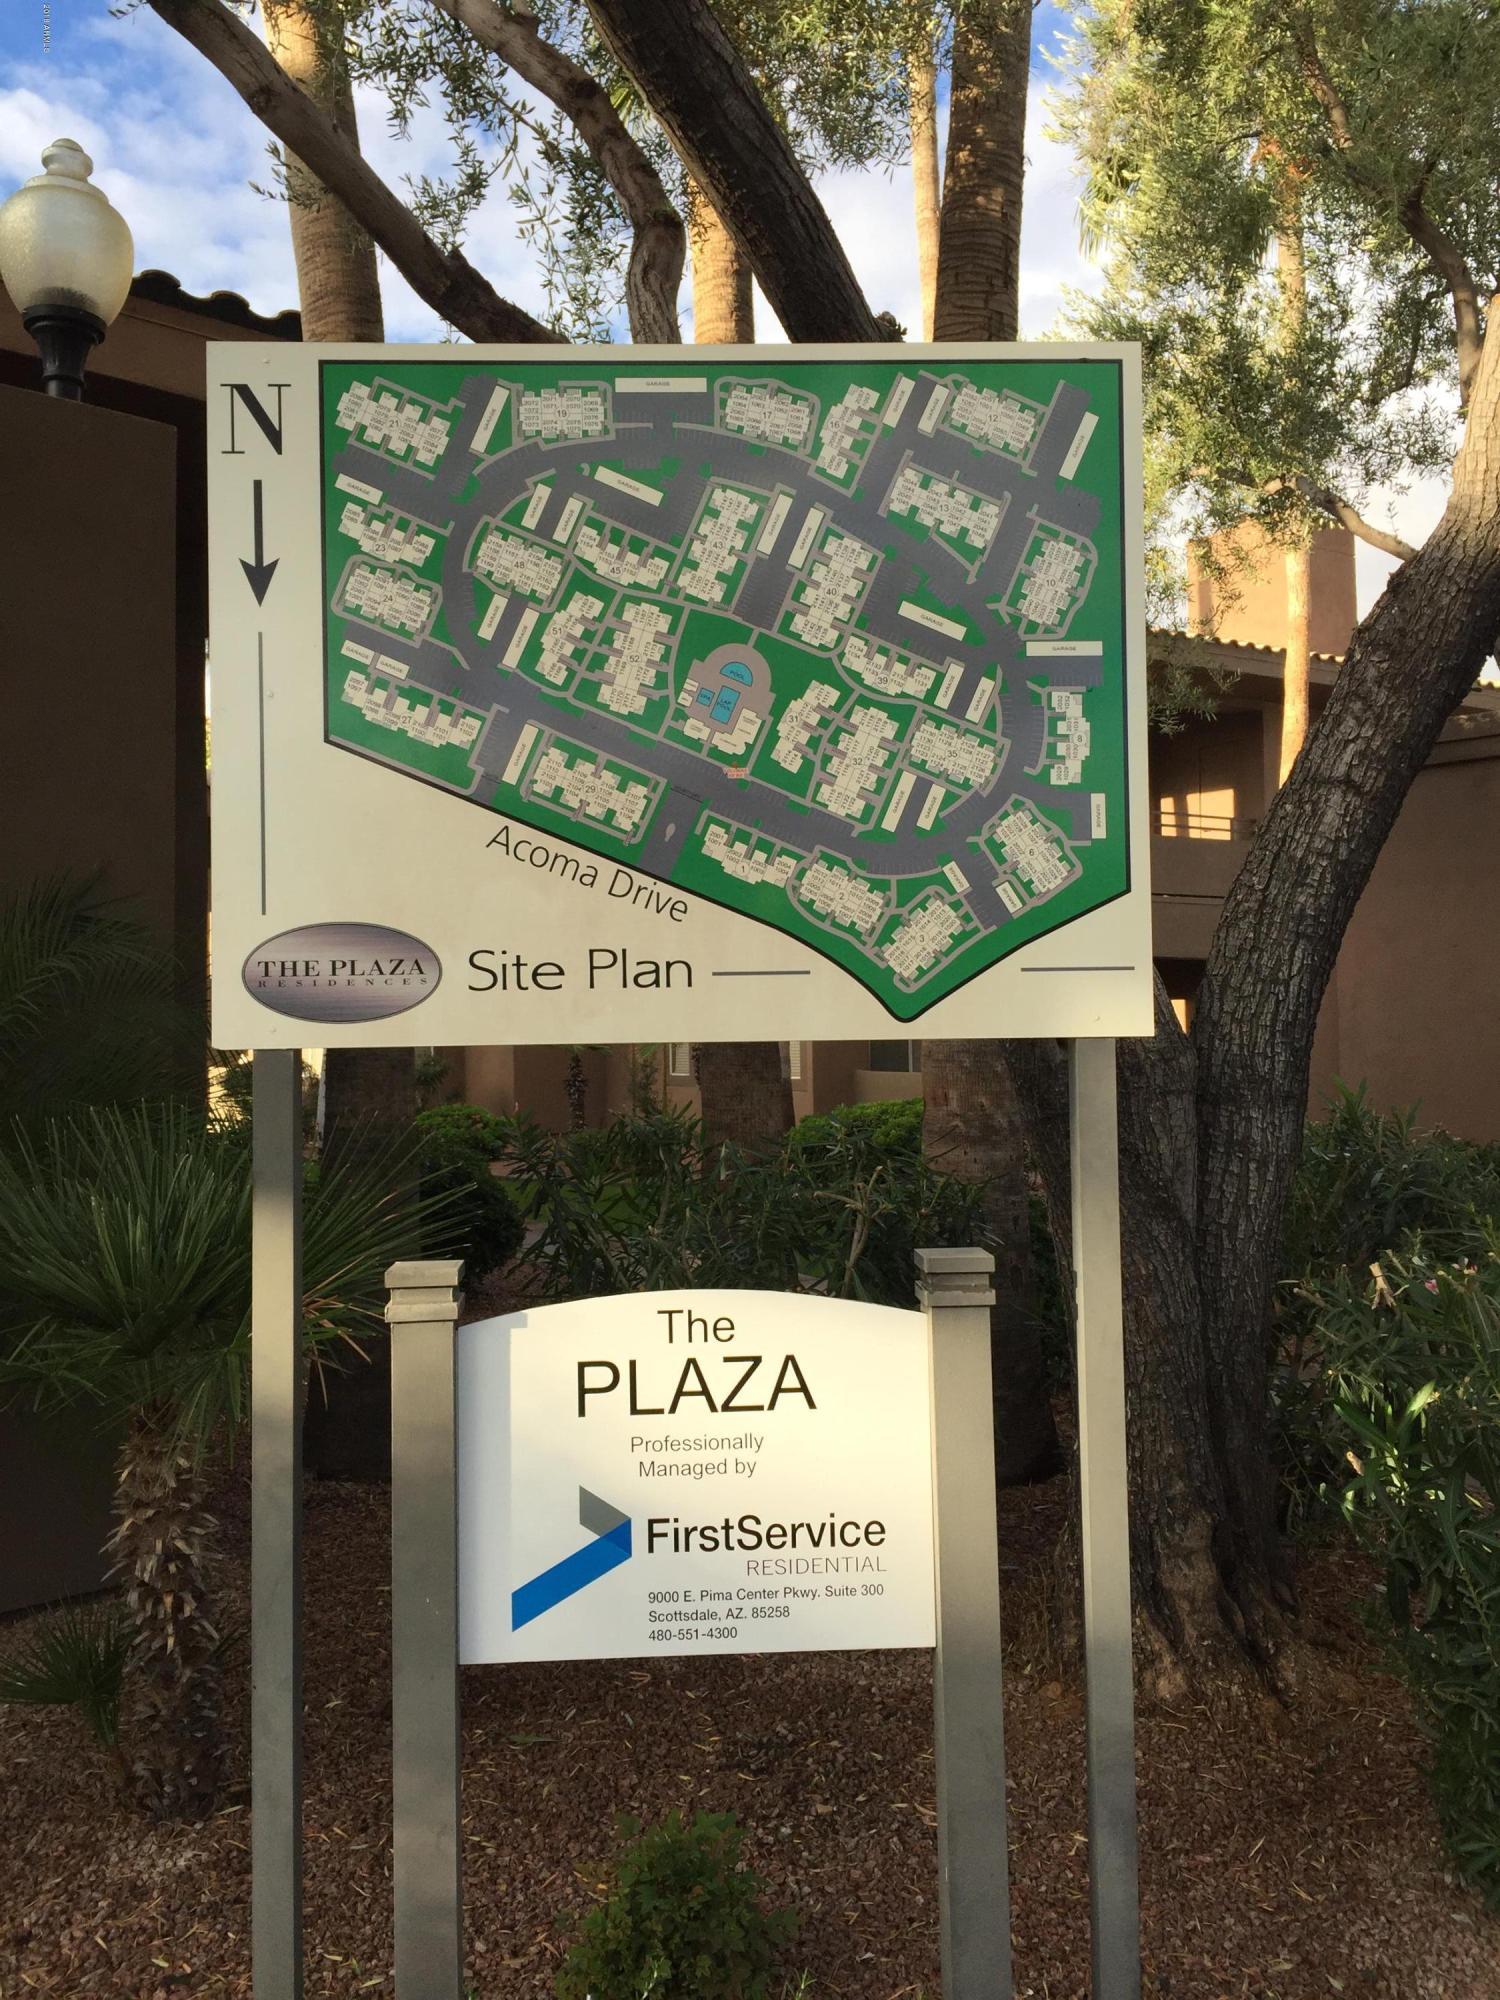 7009 E Acoma Drive Unit 2028 Scottsdale, AZ 85254 - MLS #: 5854964